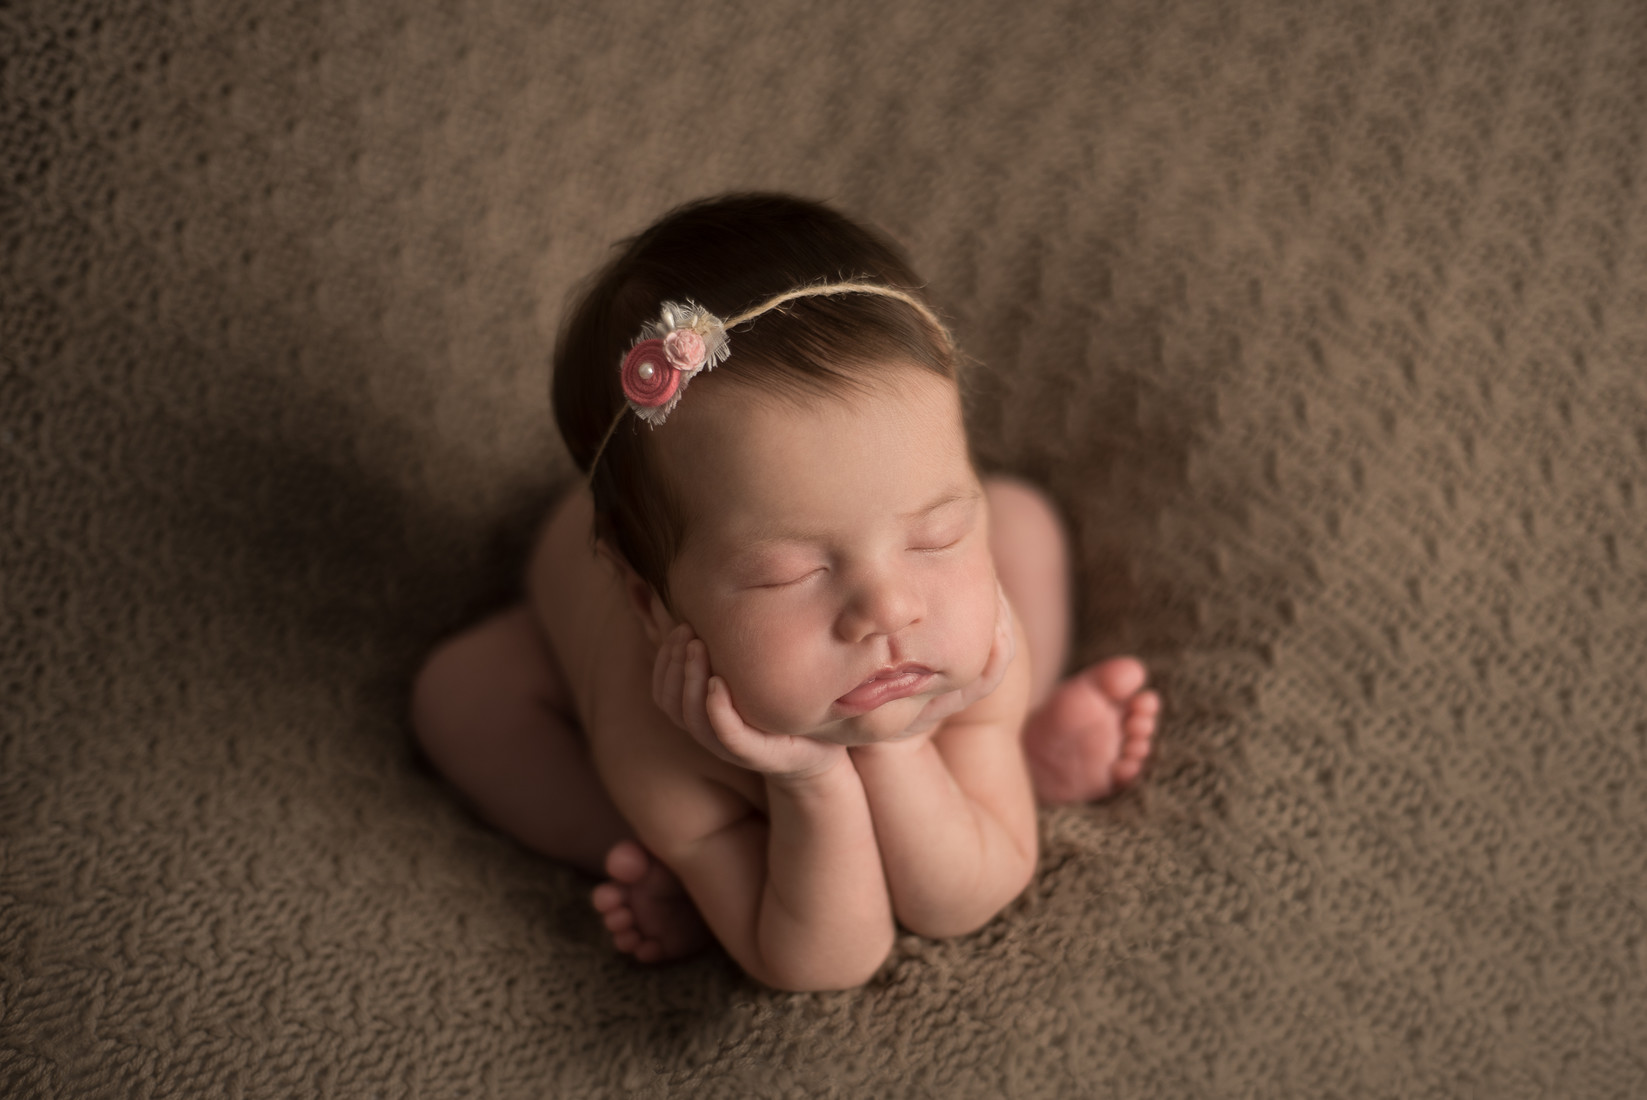 Contate Fotografia Newborn - Curitiba/PR - Mel Pierobom